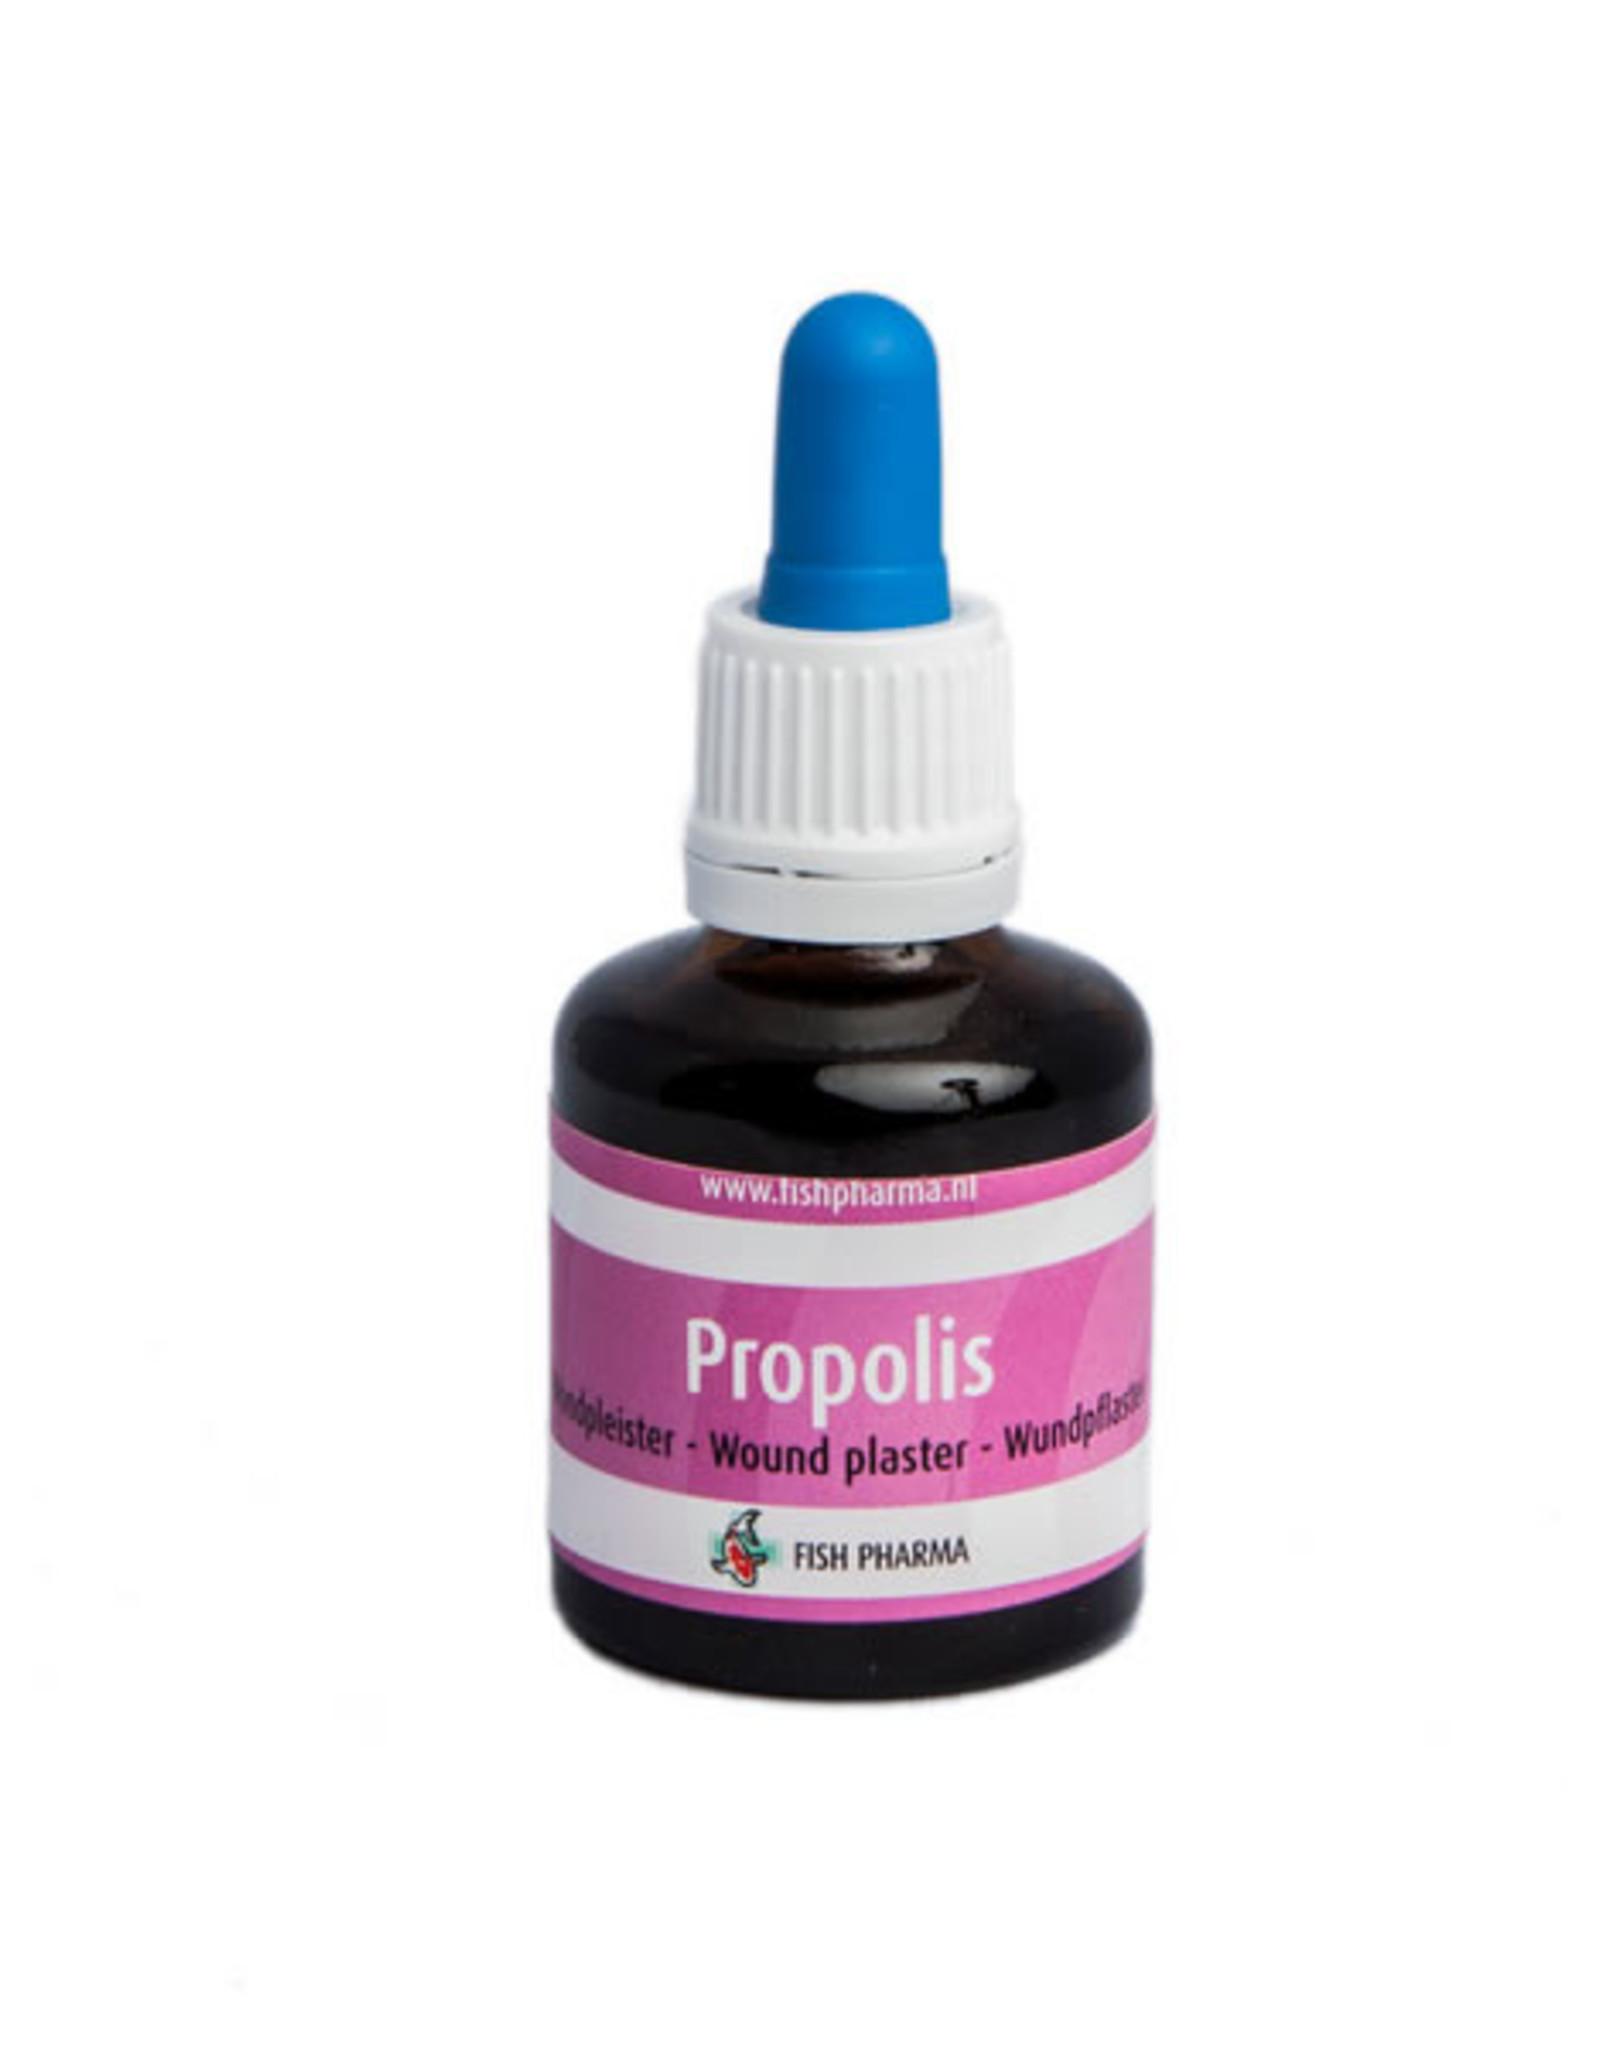 Fish Pharma Propolis Wound Care Agent